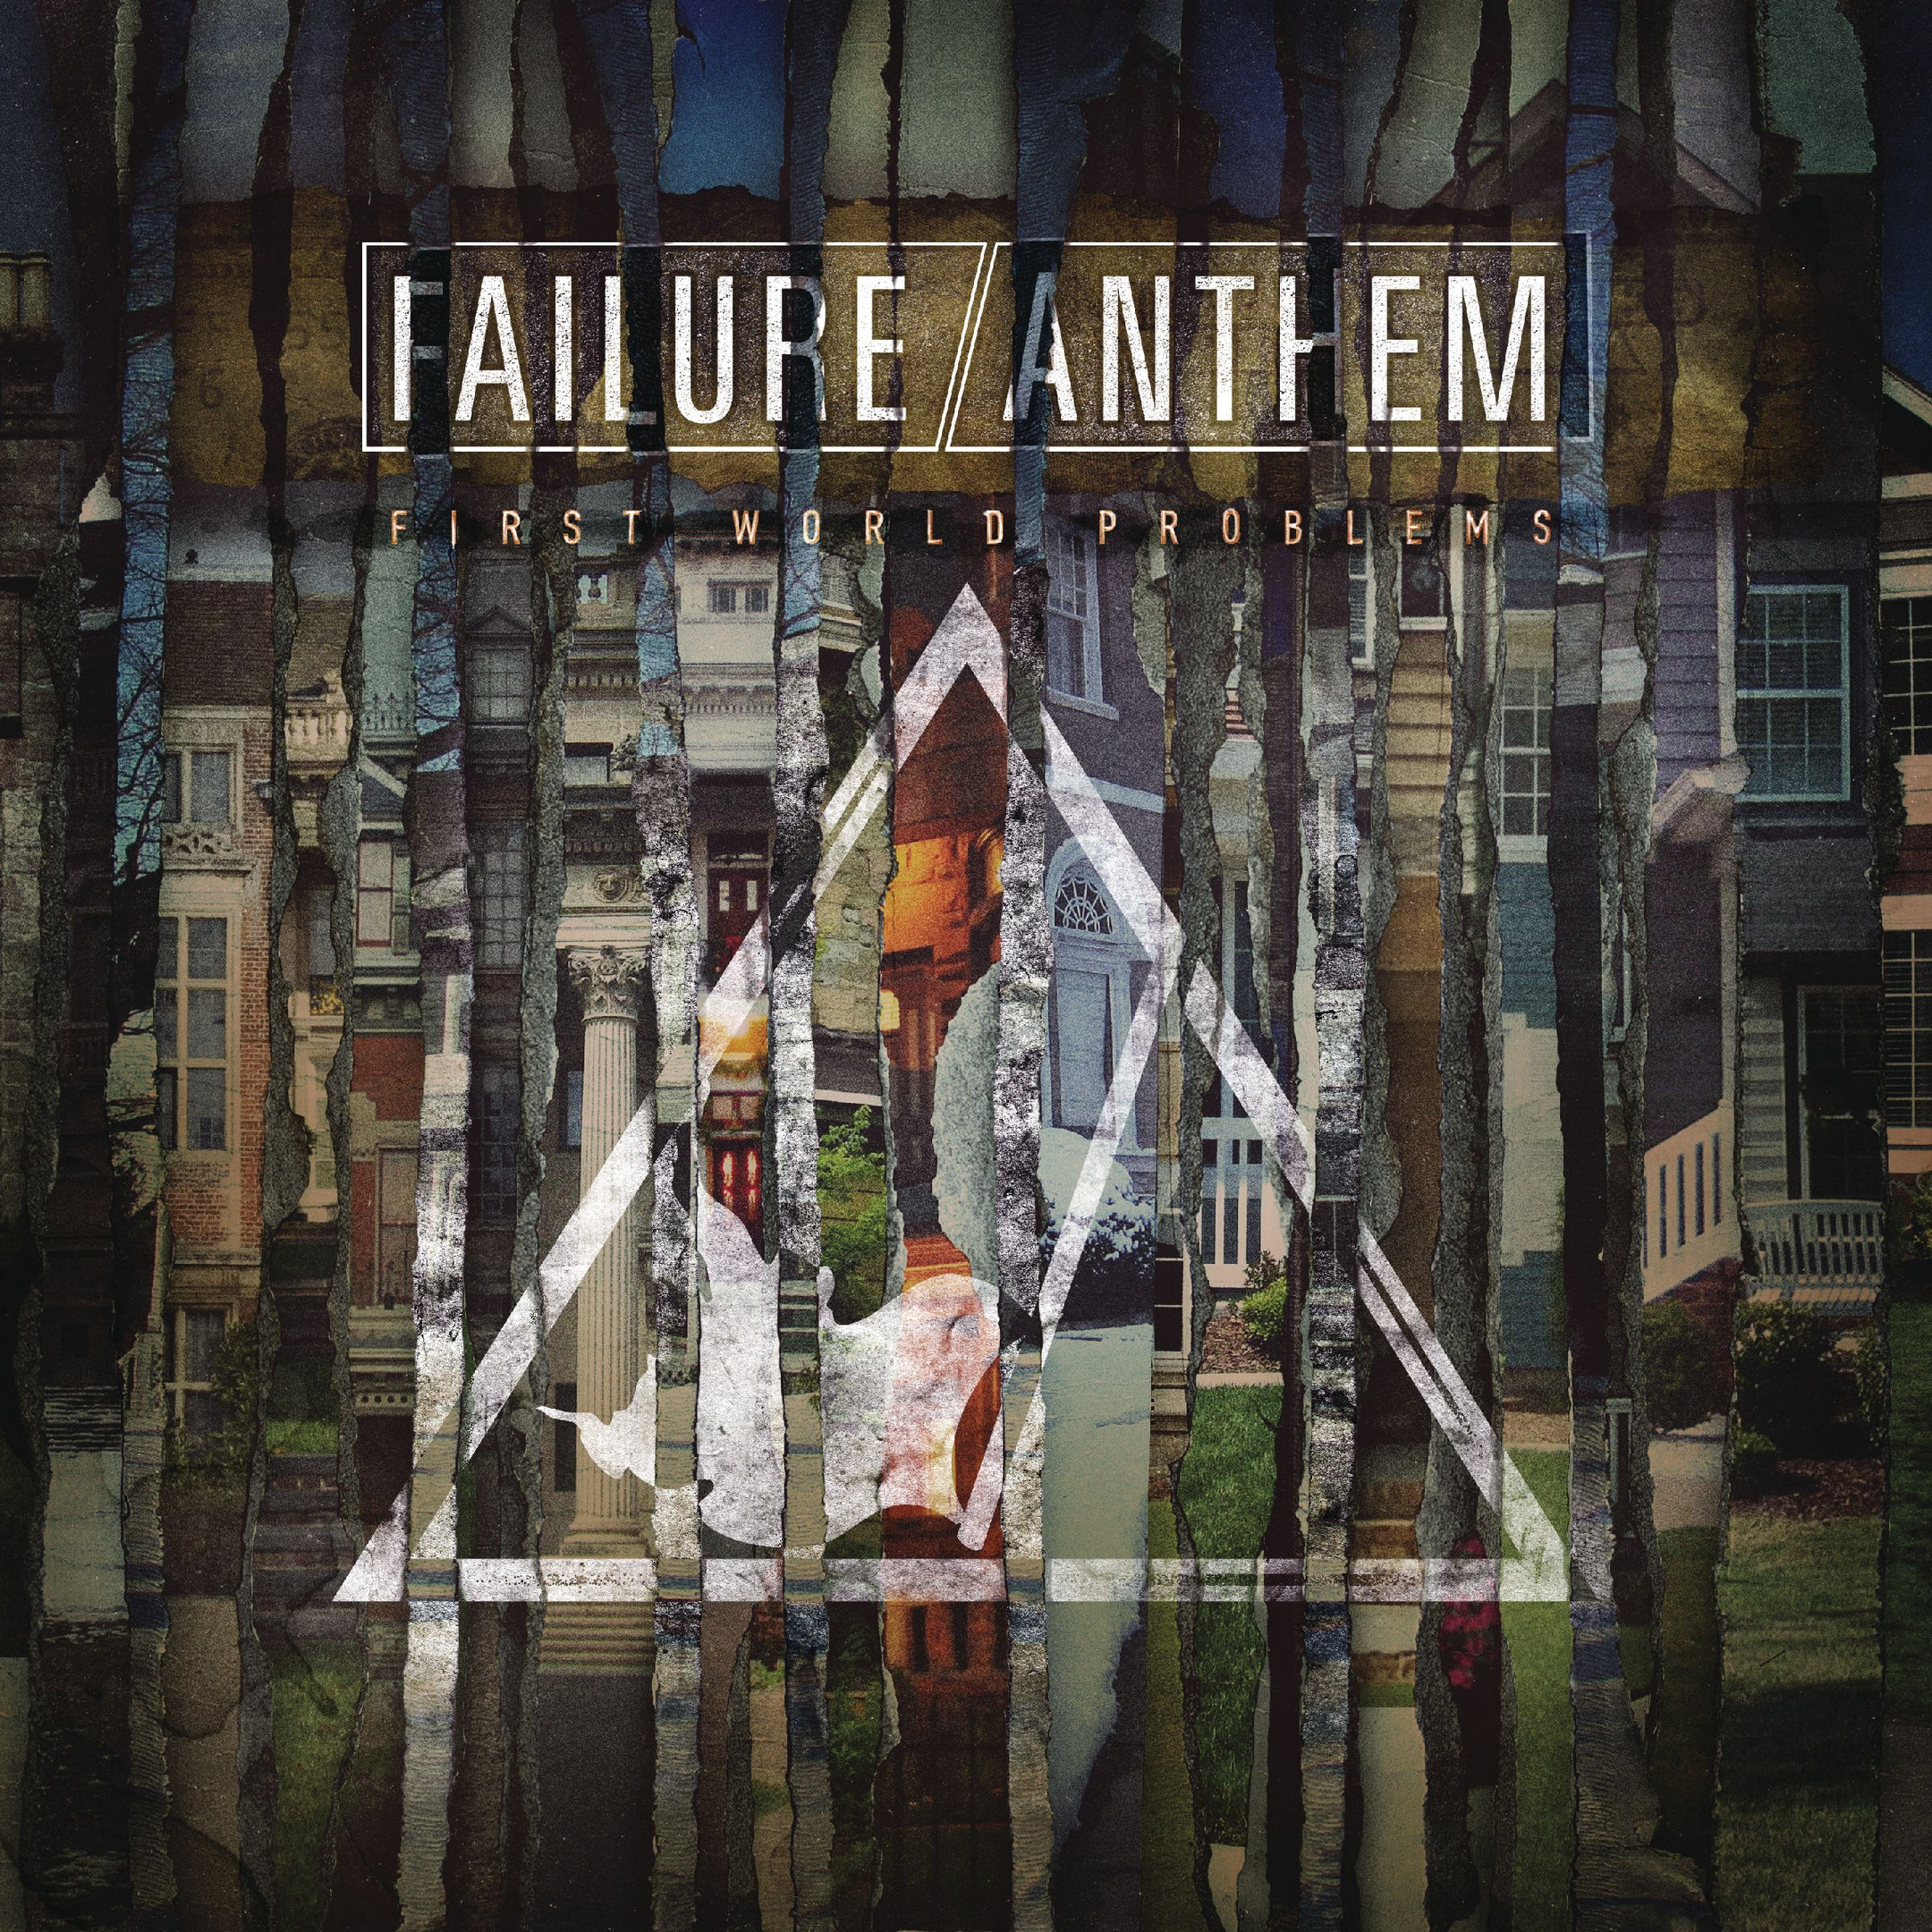 Failure Anthem - First World Problems (2016)